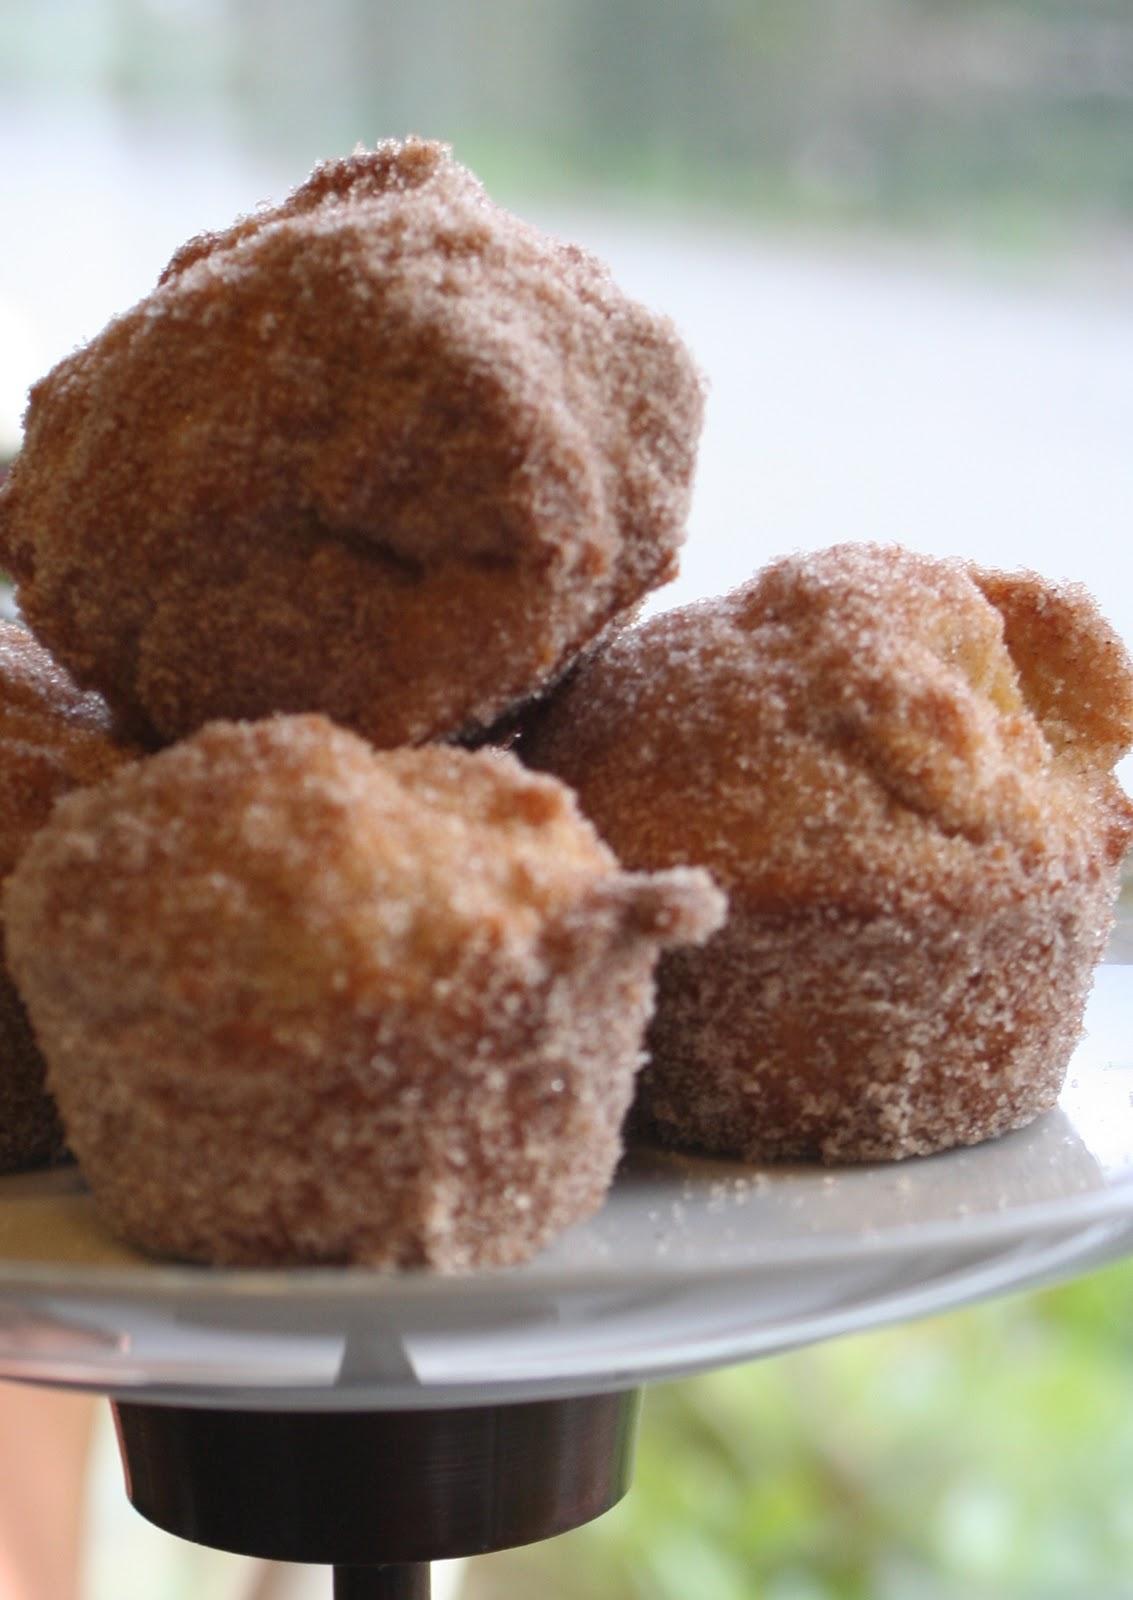 Lilliedale: Doughnut Muffins